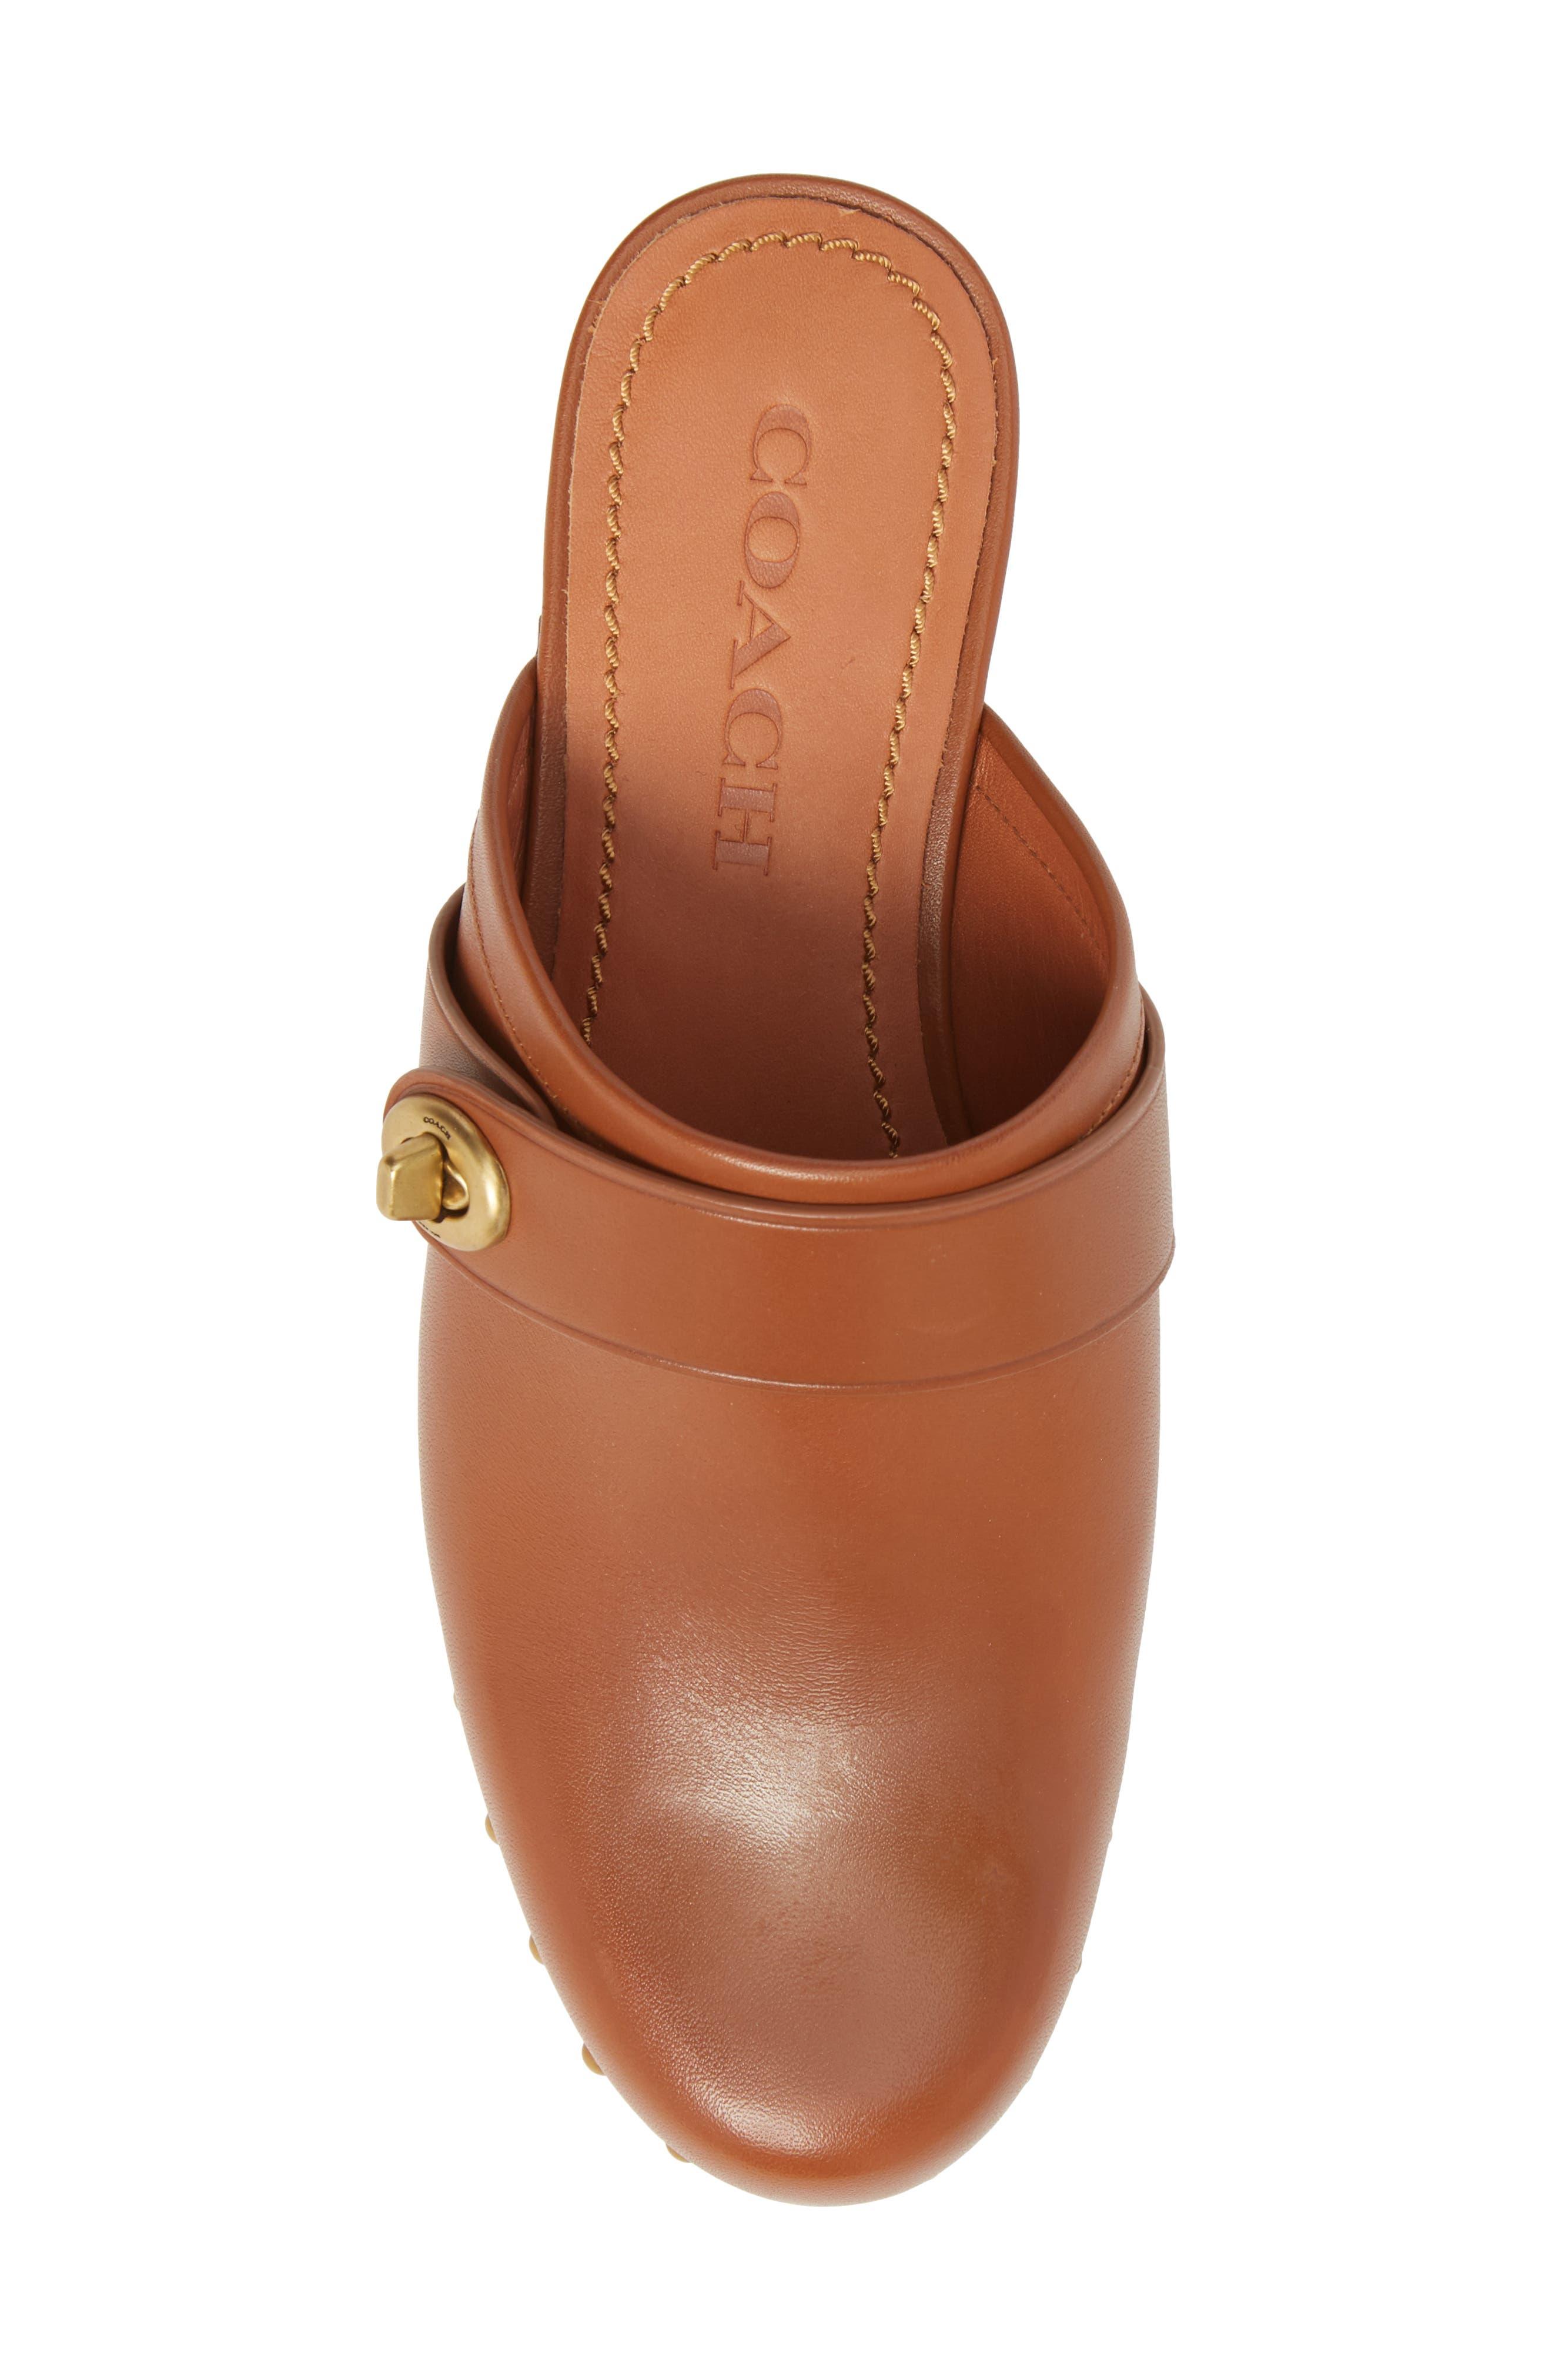 Turnlock Clog,                             Alternate thumbnail 5, color,                             Saddle Leather